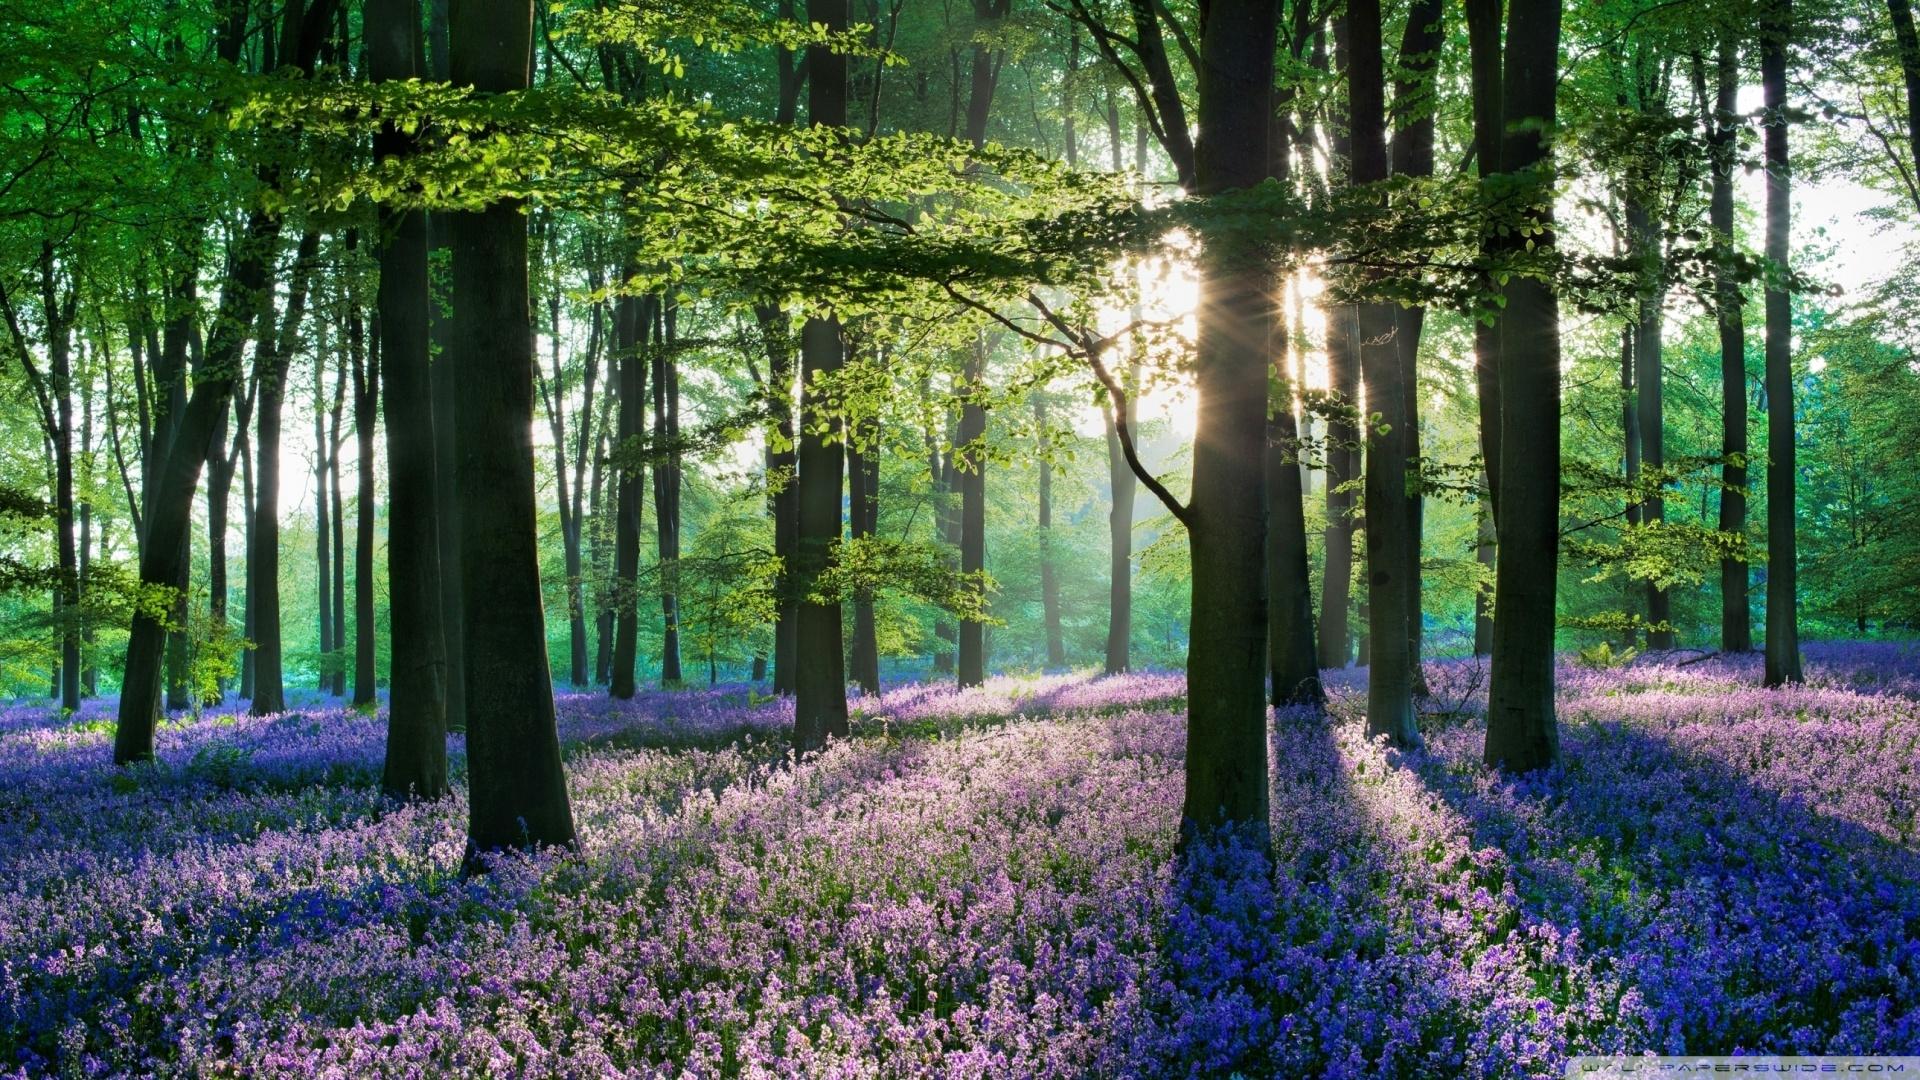 violet_forest_flowers_field-wallpaper-1920x1080